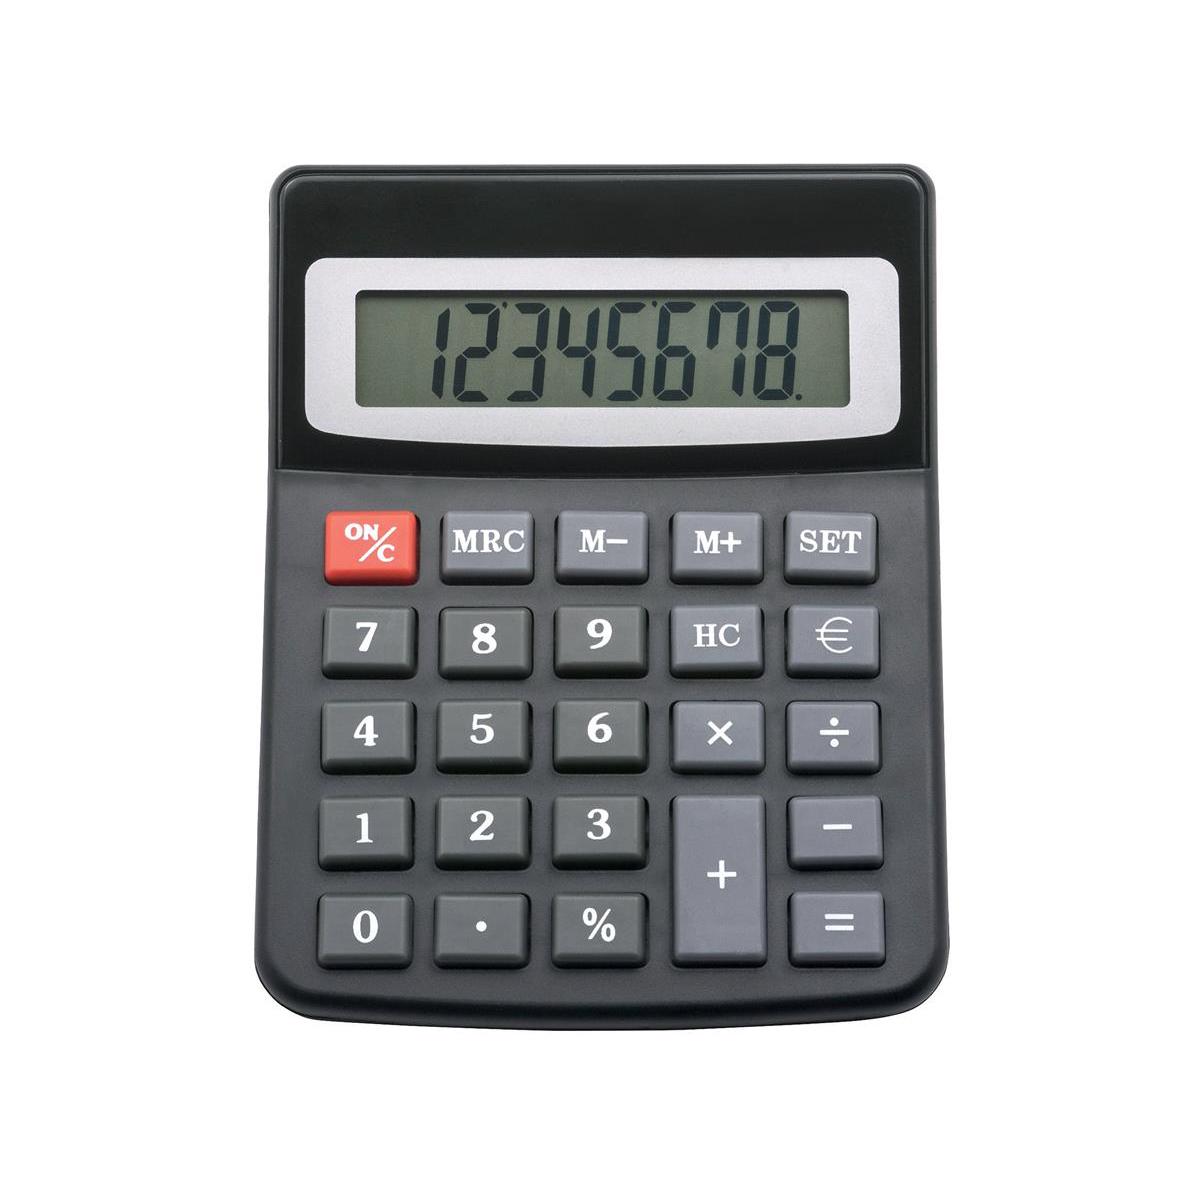 5 Star Office Desktop Calculator 8 Digit Display 3 Key Memory Battery/Solar Power 100x13x130mm Black